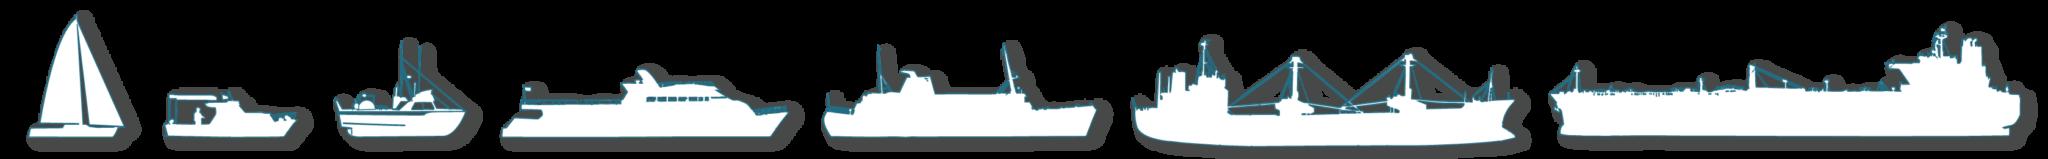 Siluetas diferentes tipos de barco portada Acastimar